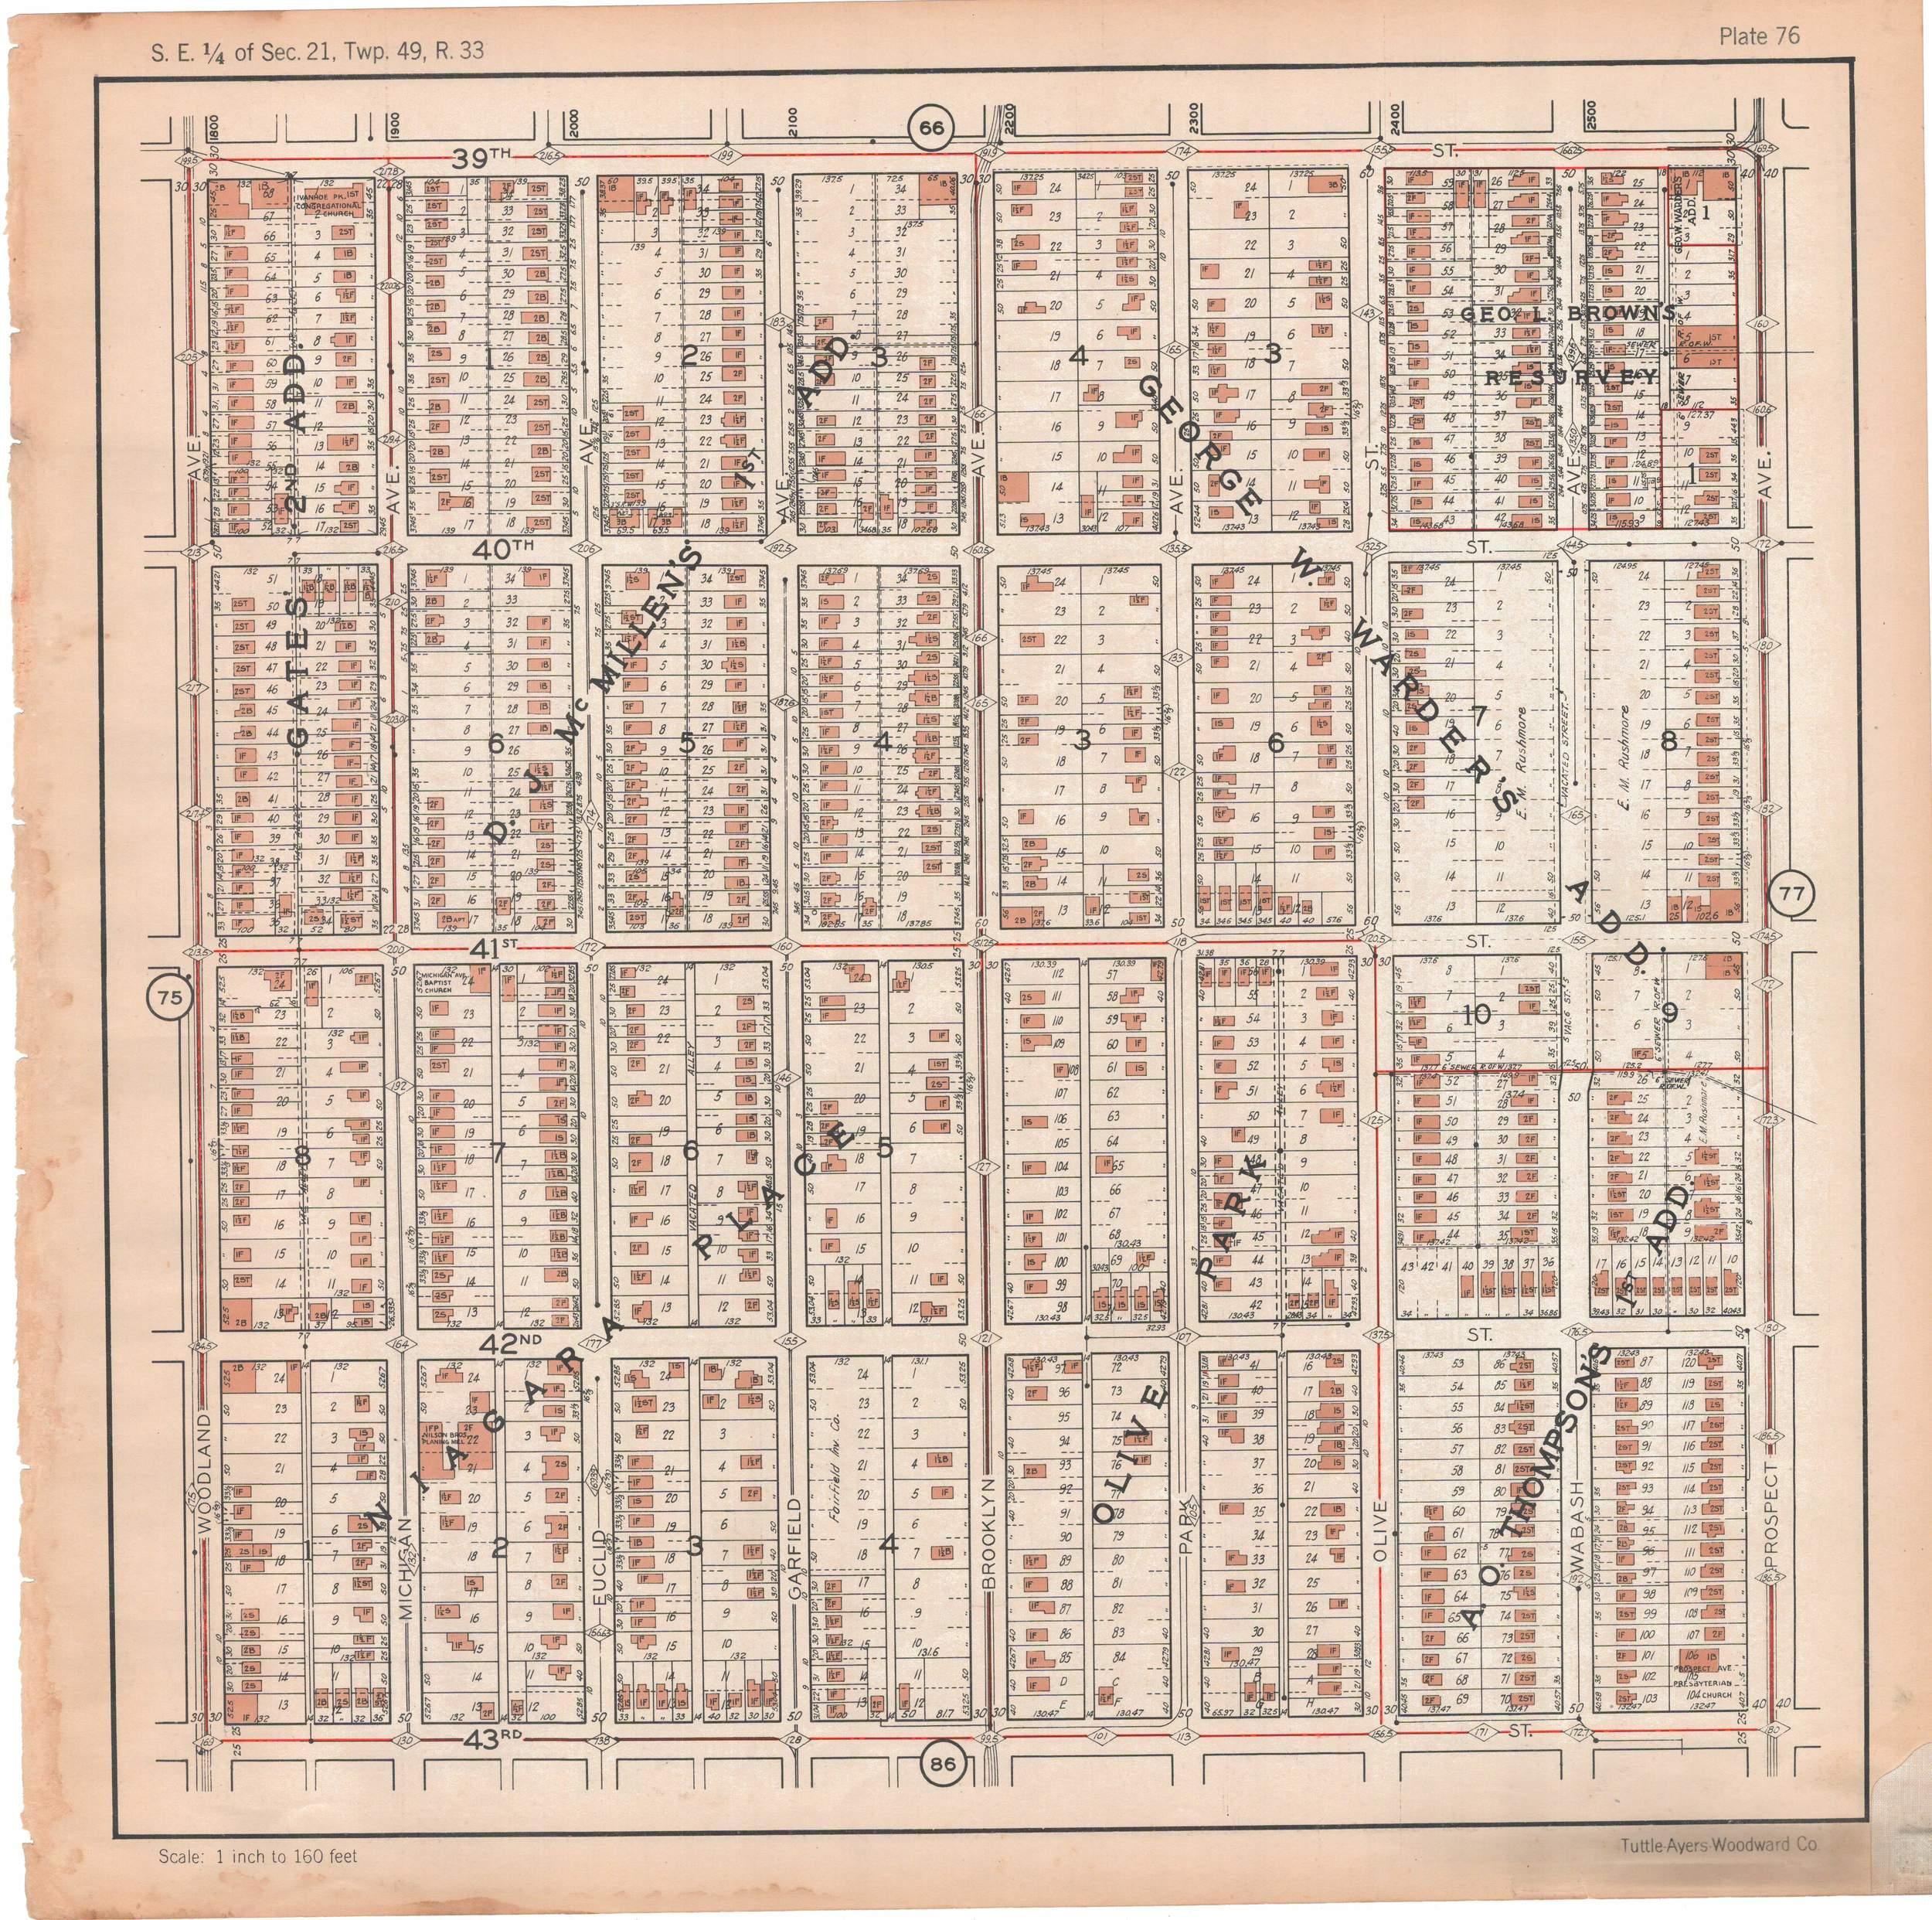 1925 TUTTLE_AYERS_Plate 76.JPG